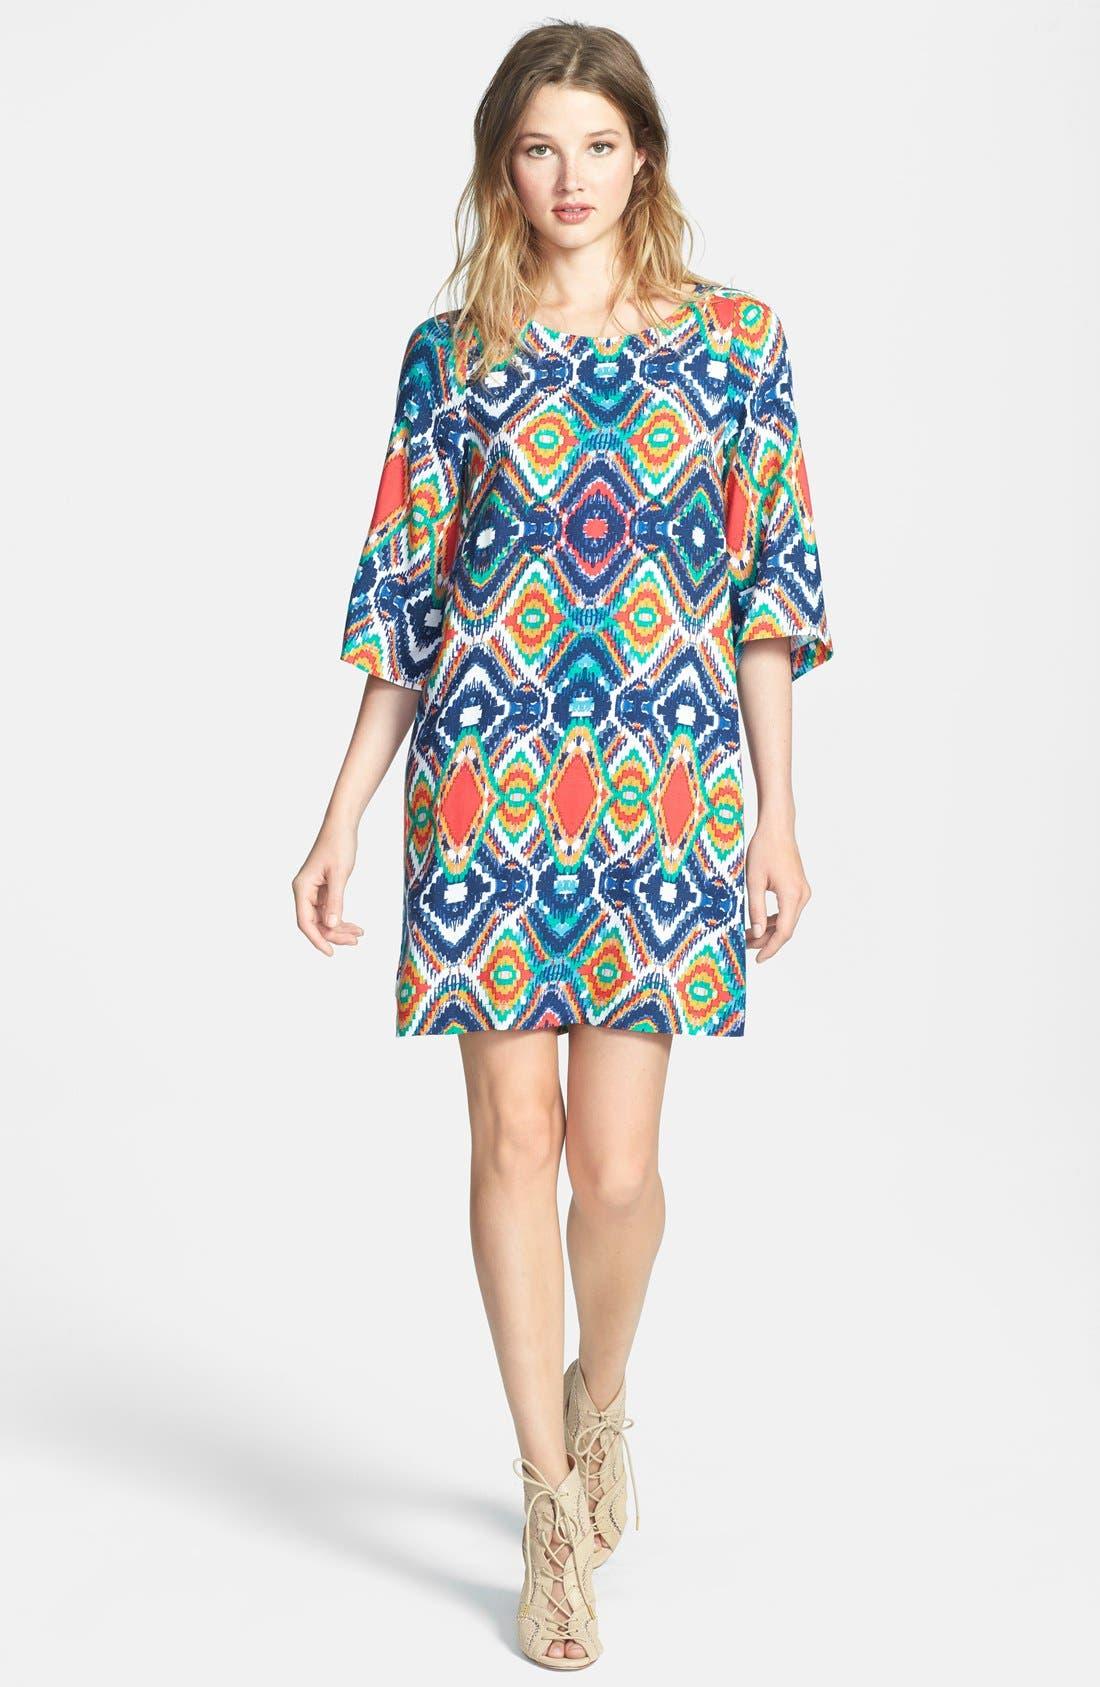 Alternate Image 1 Selected - Ella Moss 'Totem' Geo Print Shift Dress